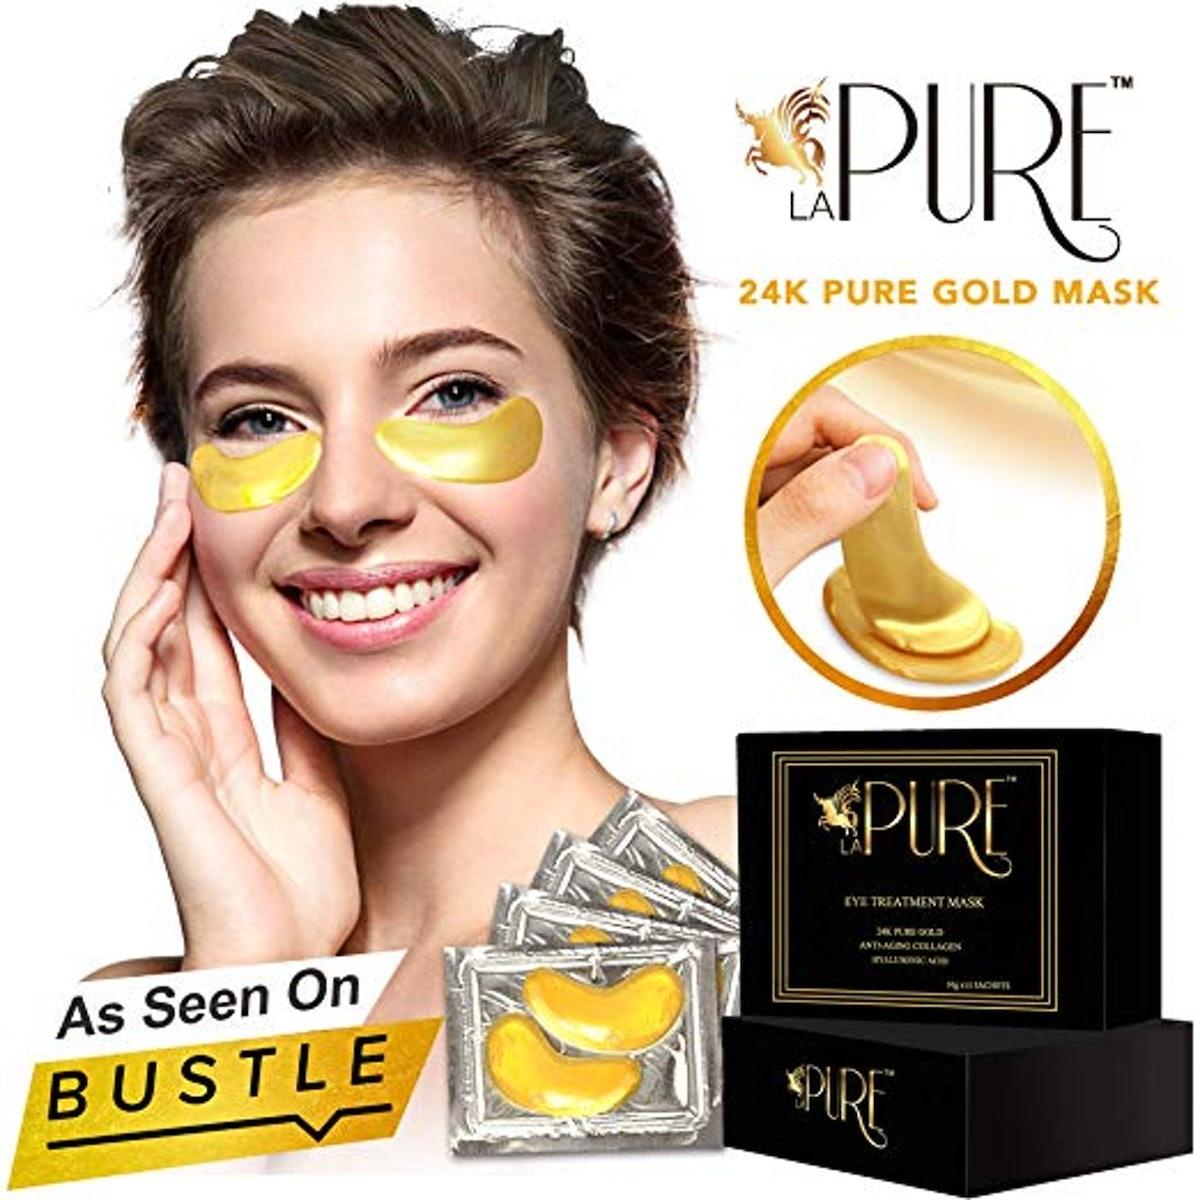 LA PURE 24K Gold Eye Treatment Masks (15-Pack)